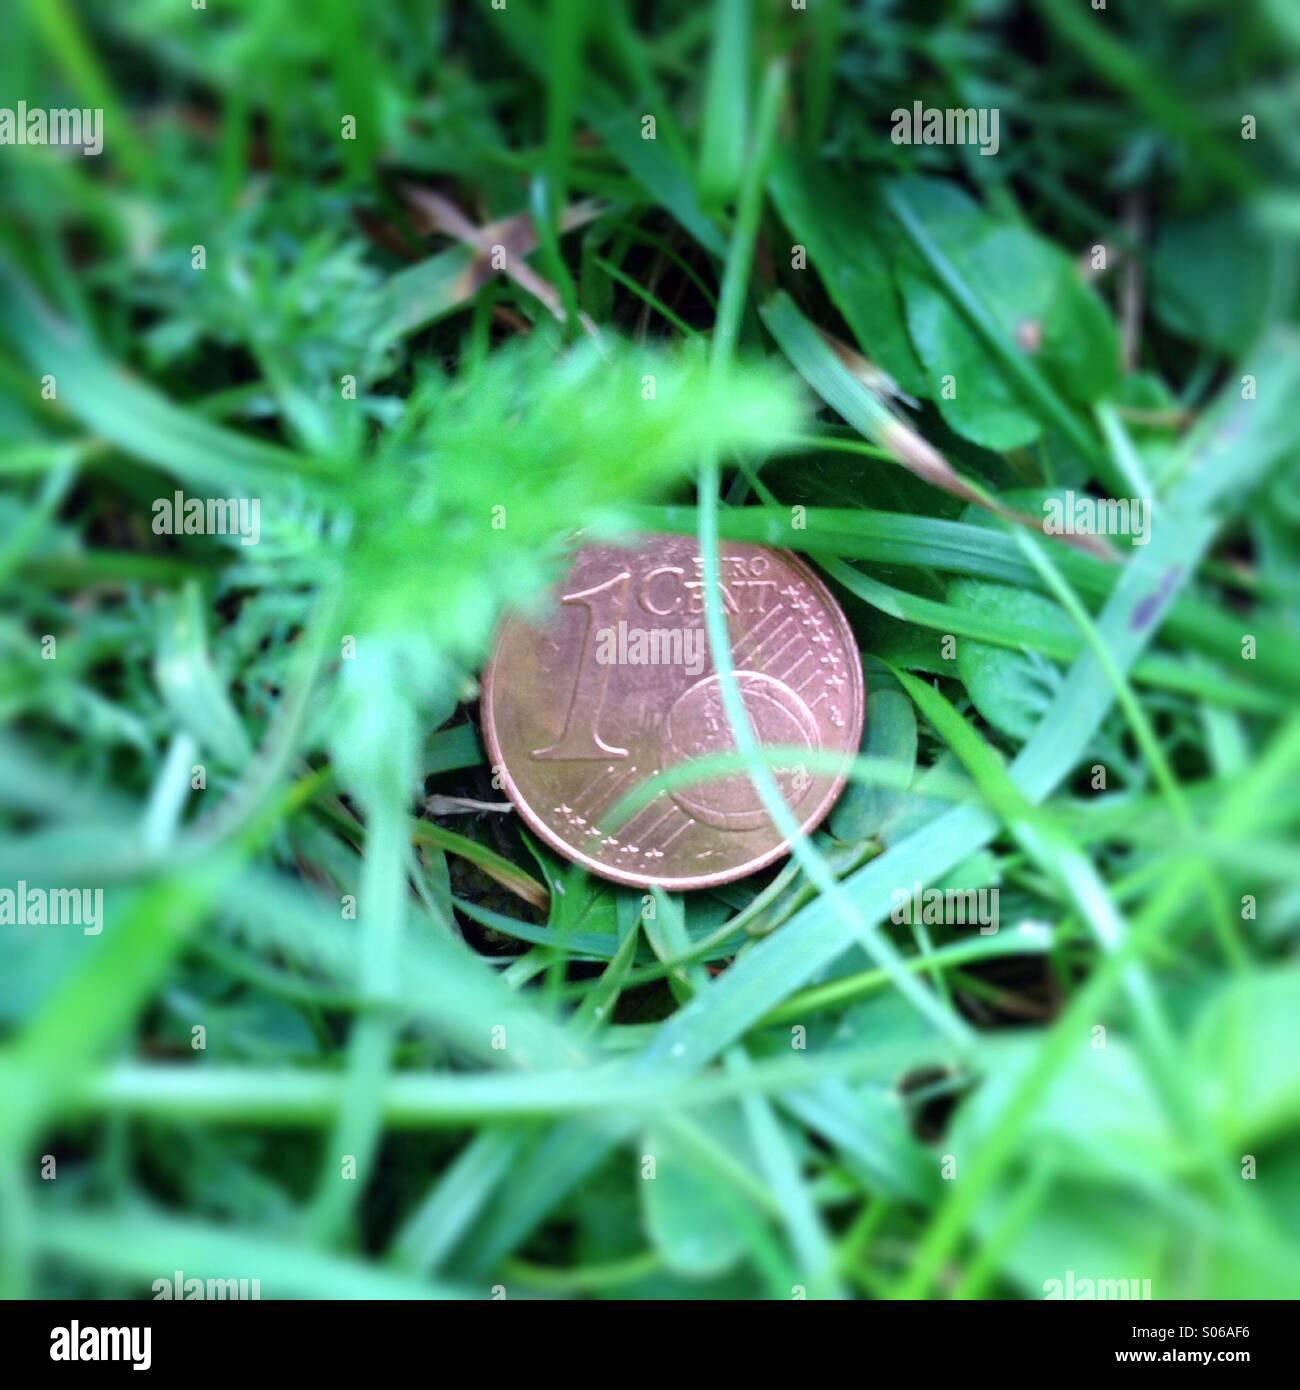 Cent im Gras - Stock Image